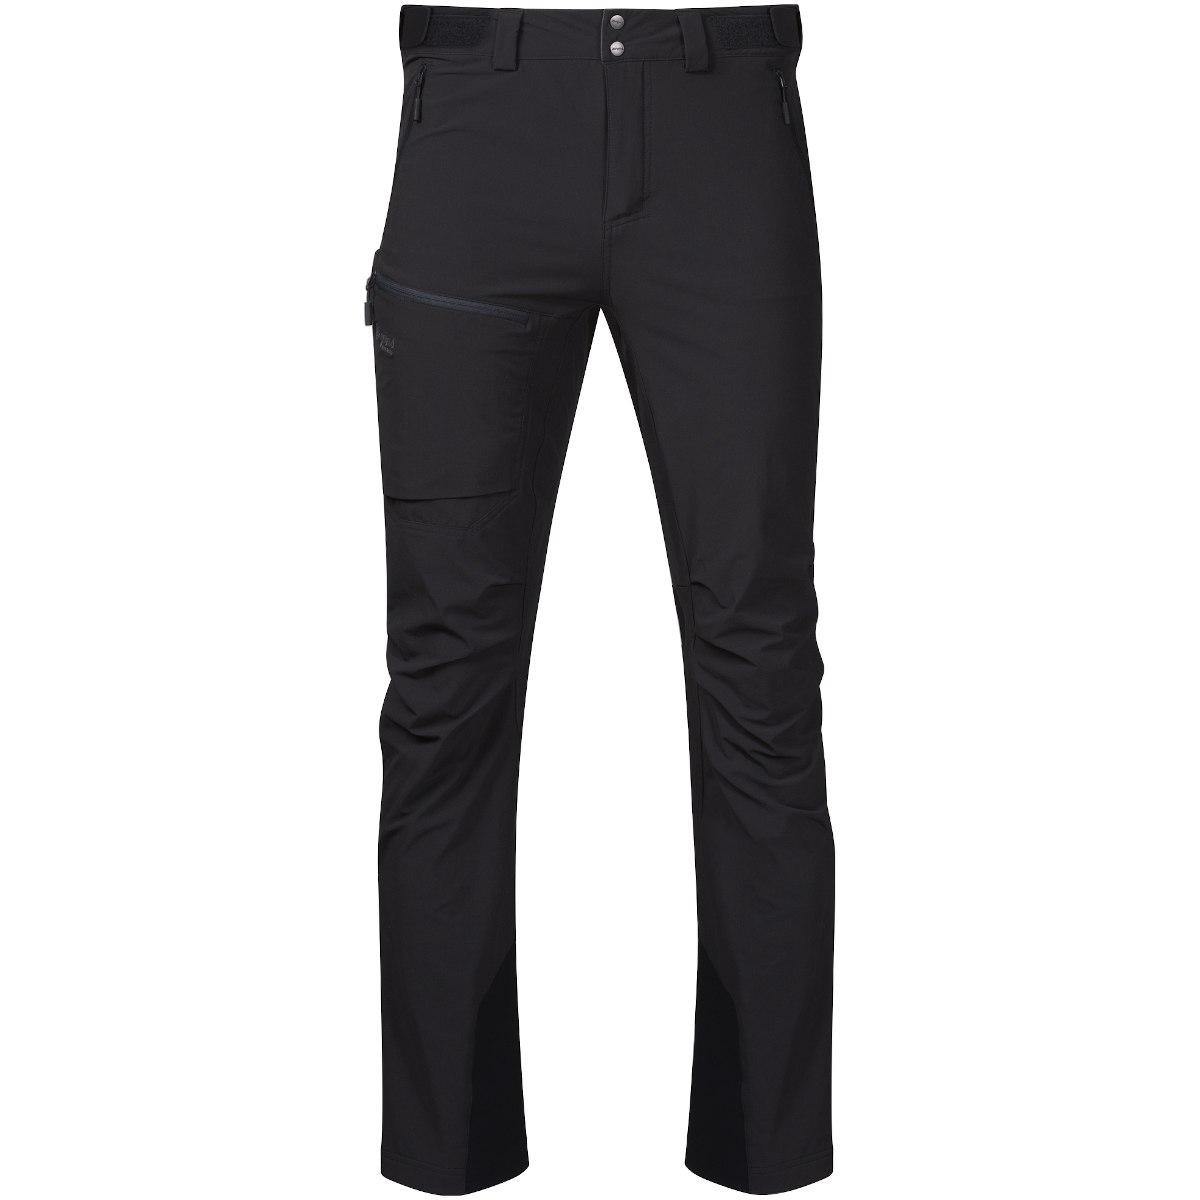 Bergans Breheimen Softshell Pants - black/solid charcoal